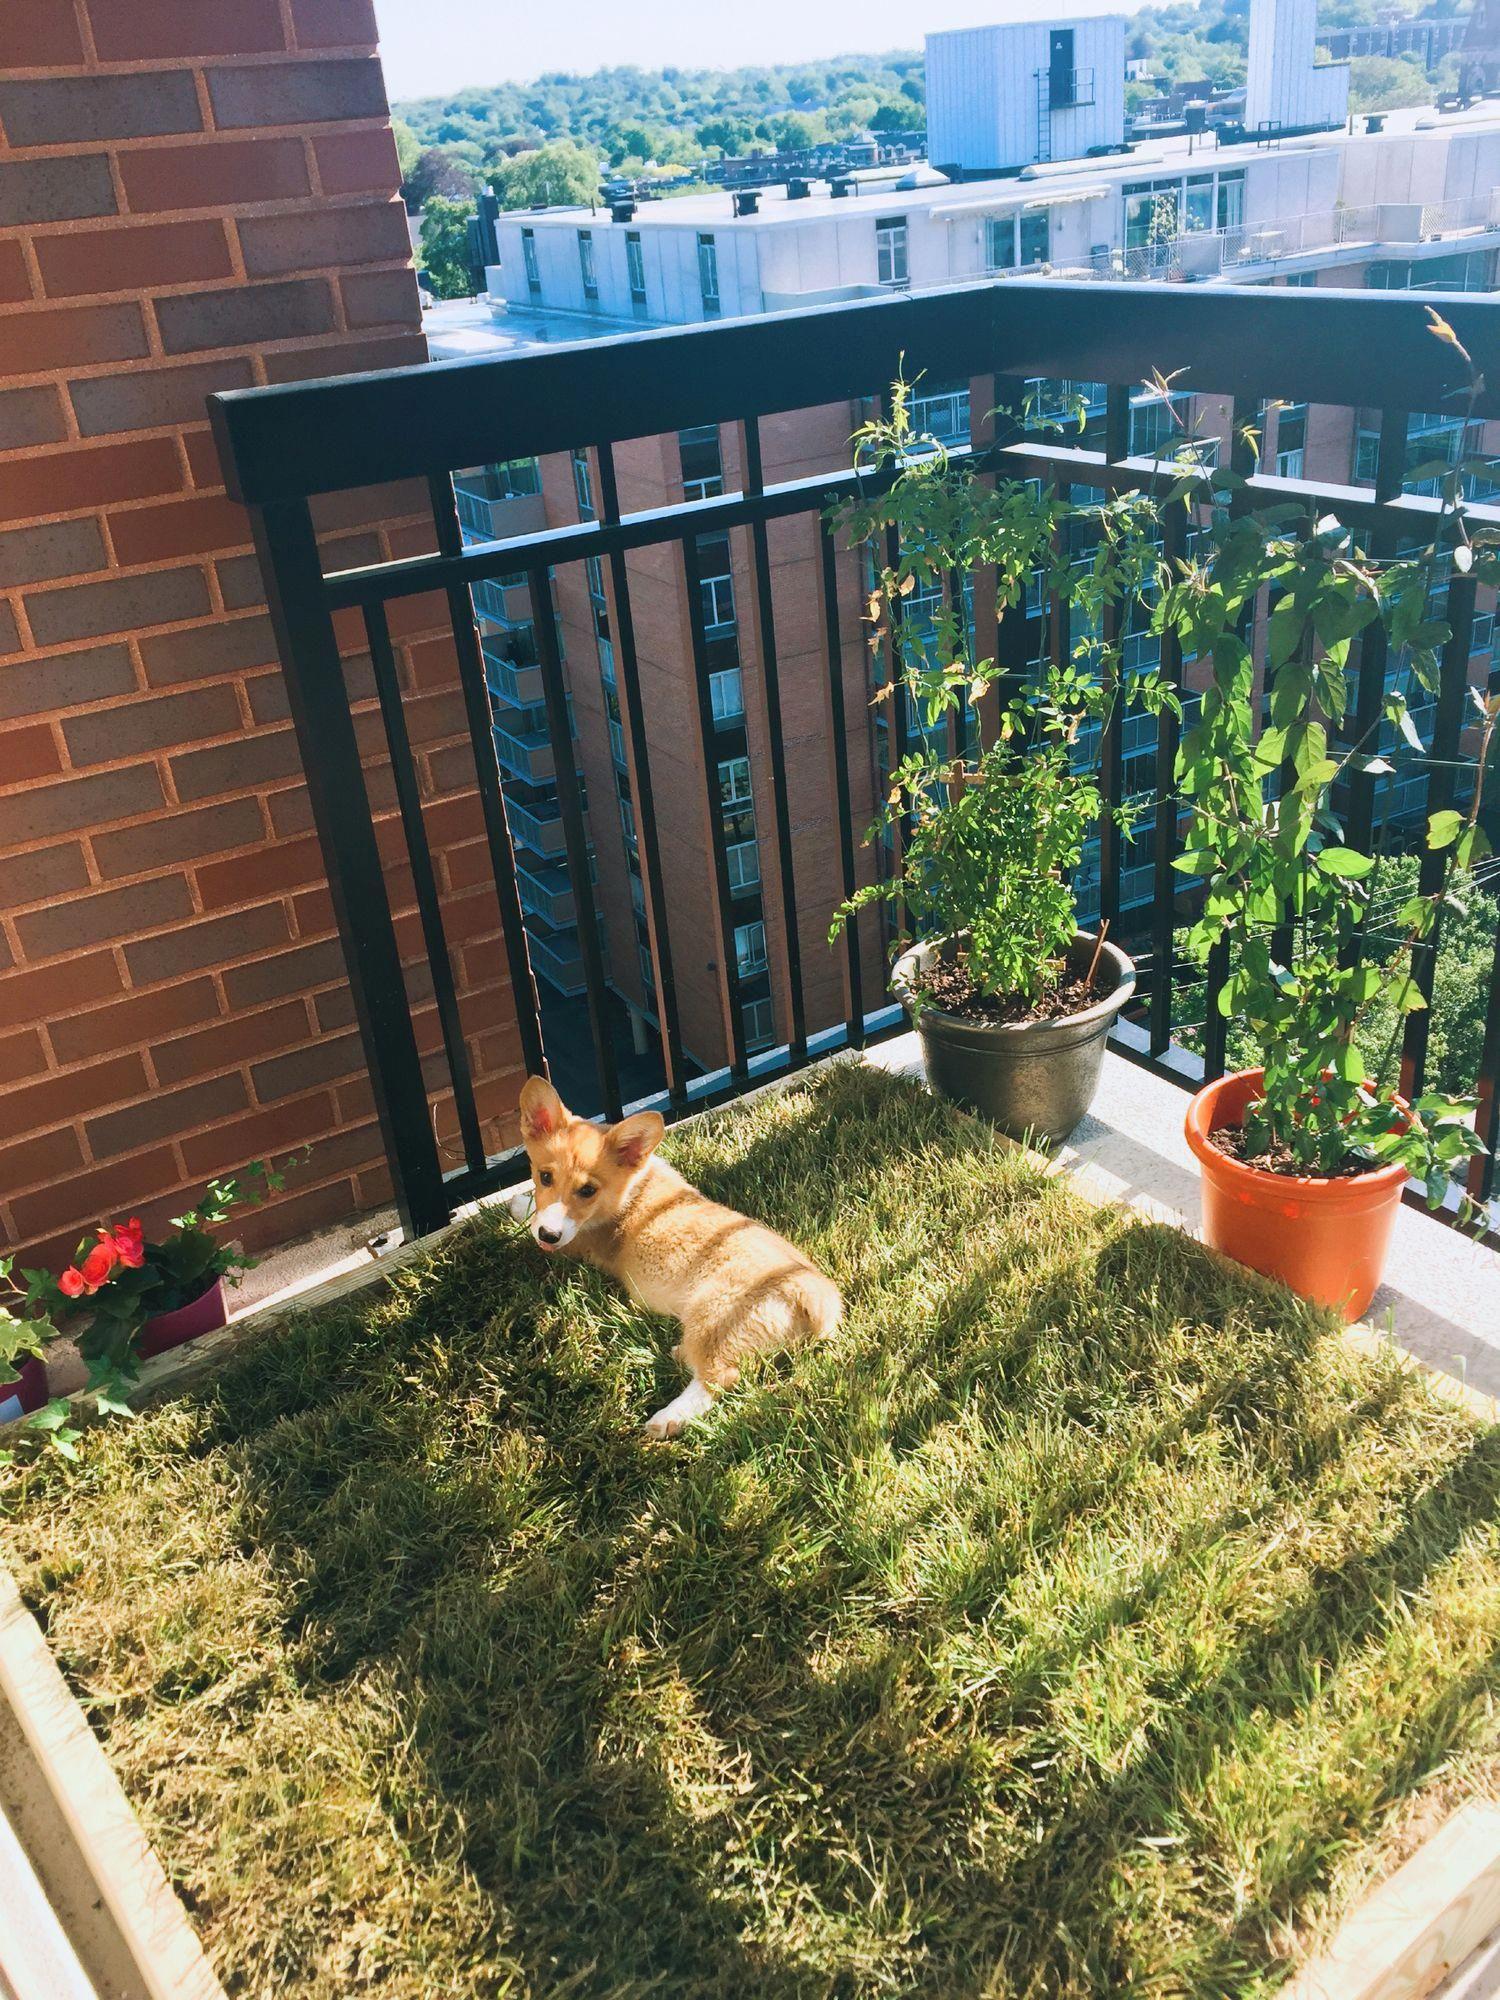 Diy dog grass potty box for apartment pets dog area